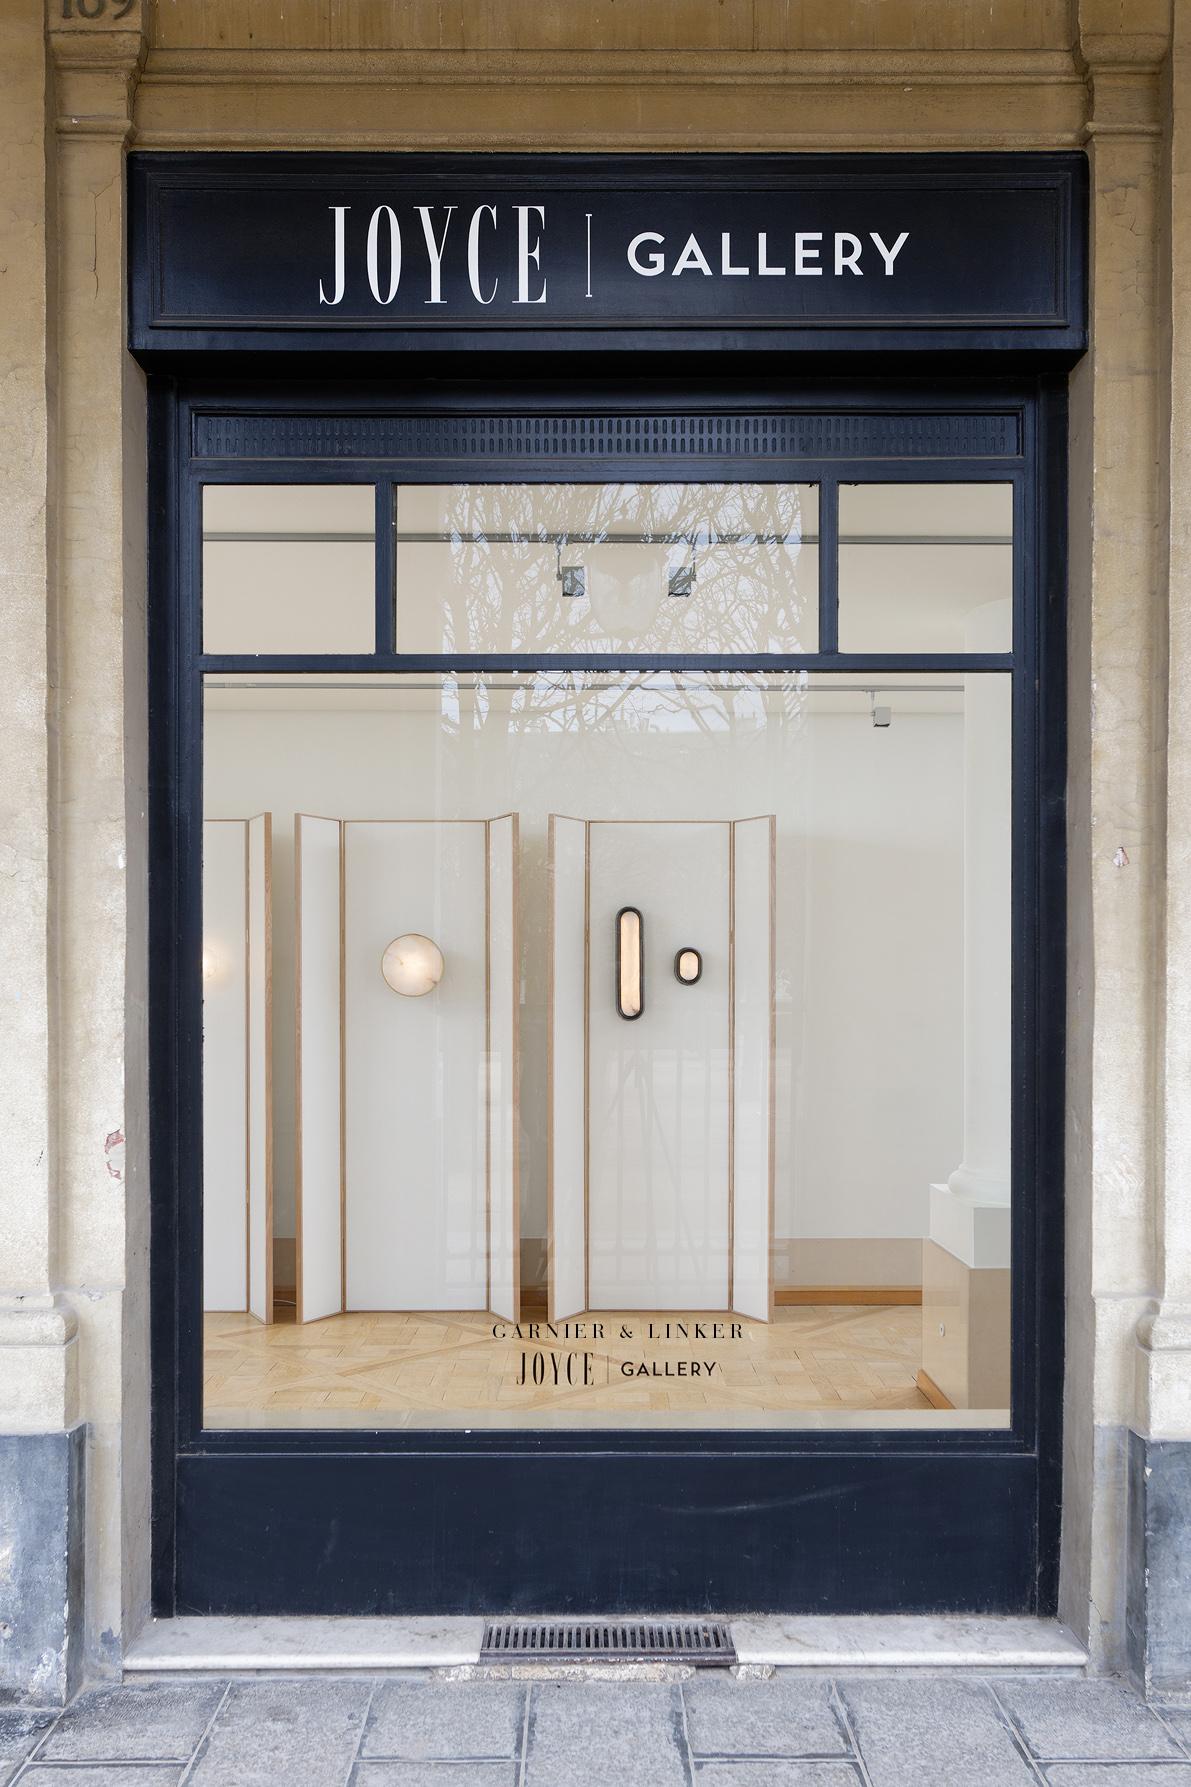 SOLO SHOW / Joyce Gallery, March 2018, Paris - France